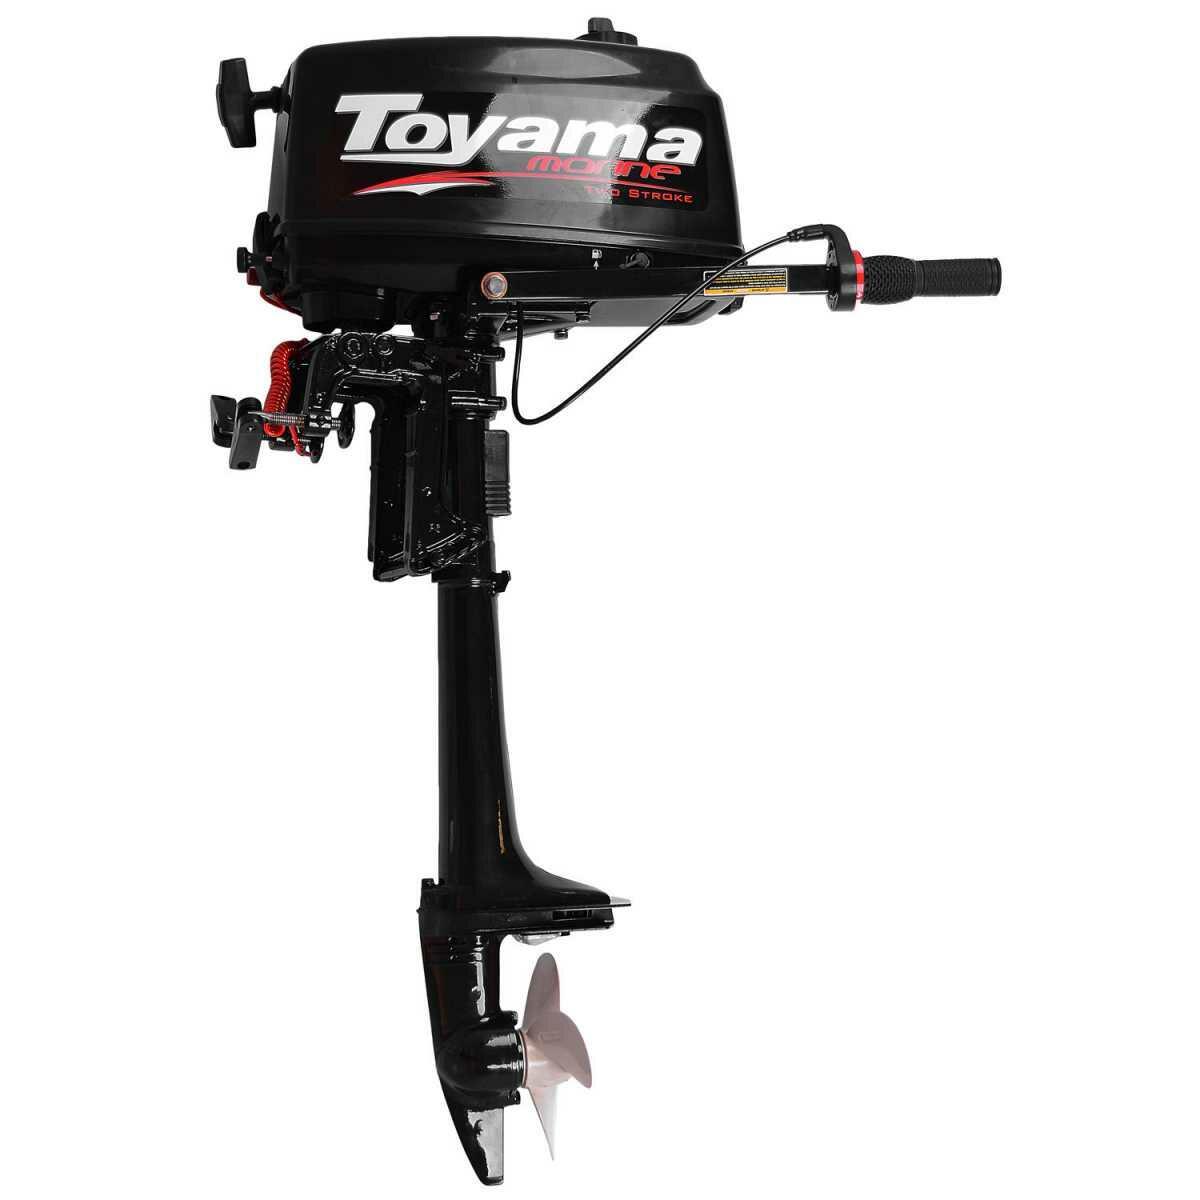 Motor de Popa de Barco a Gasolina 2.6Hp Tm2.6Ts Toyama